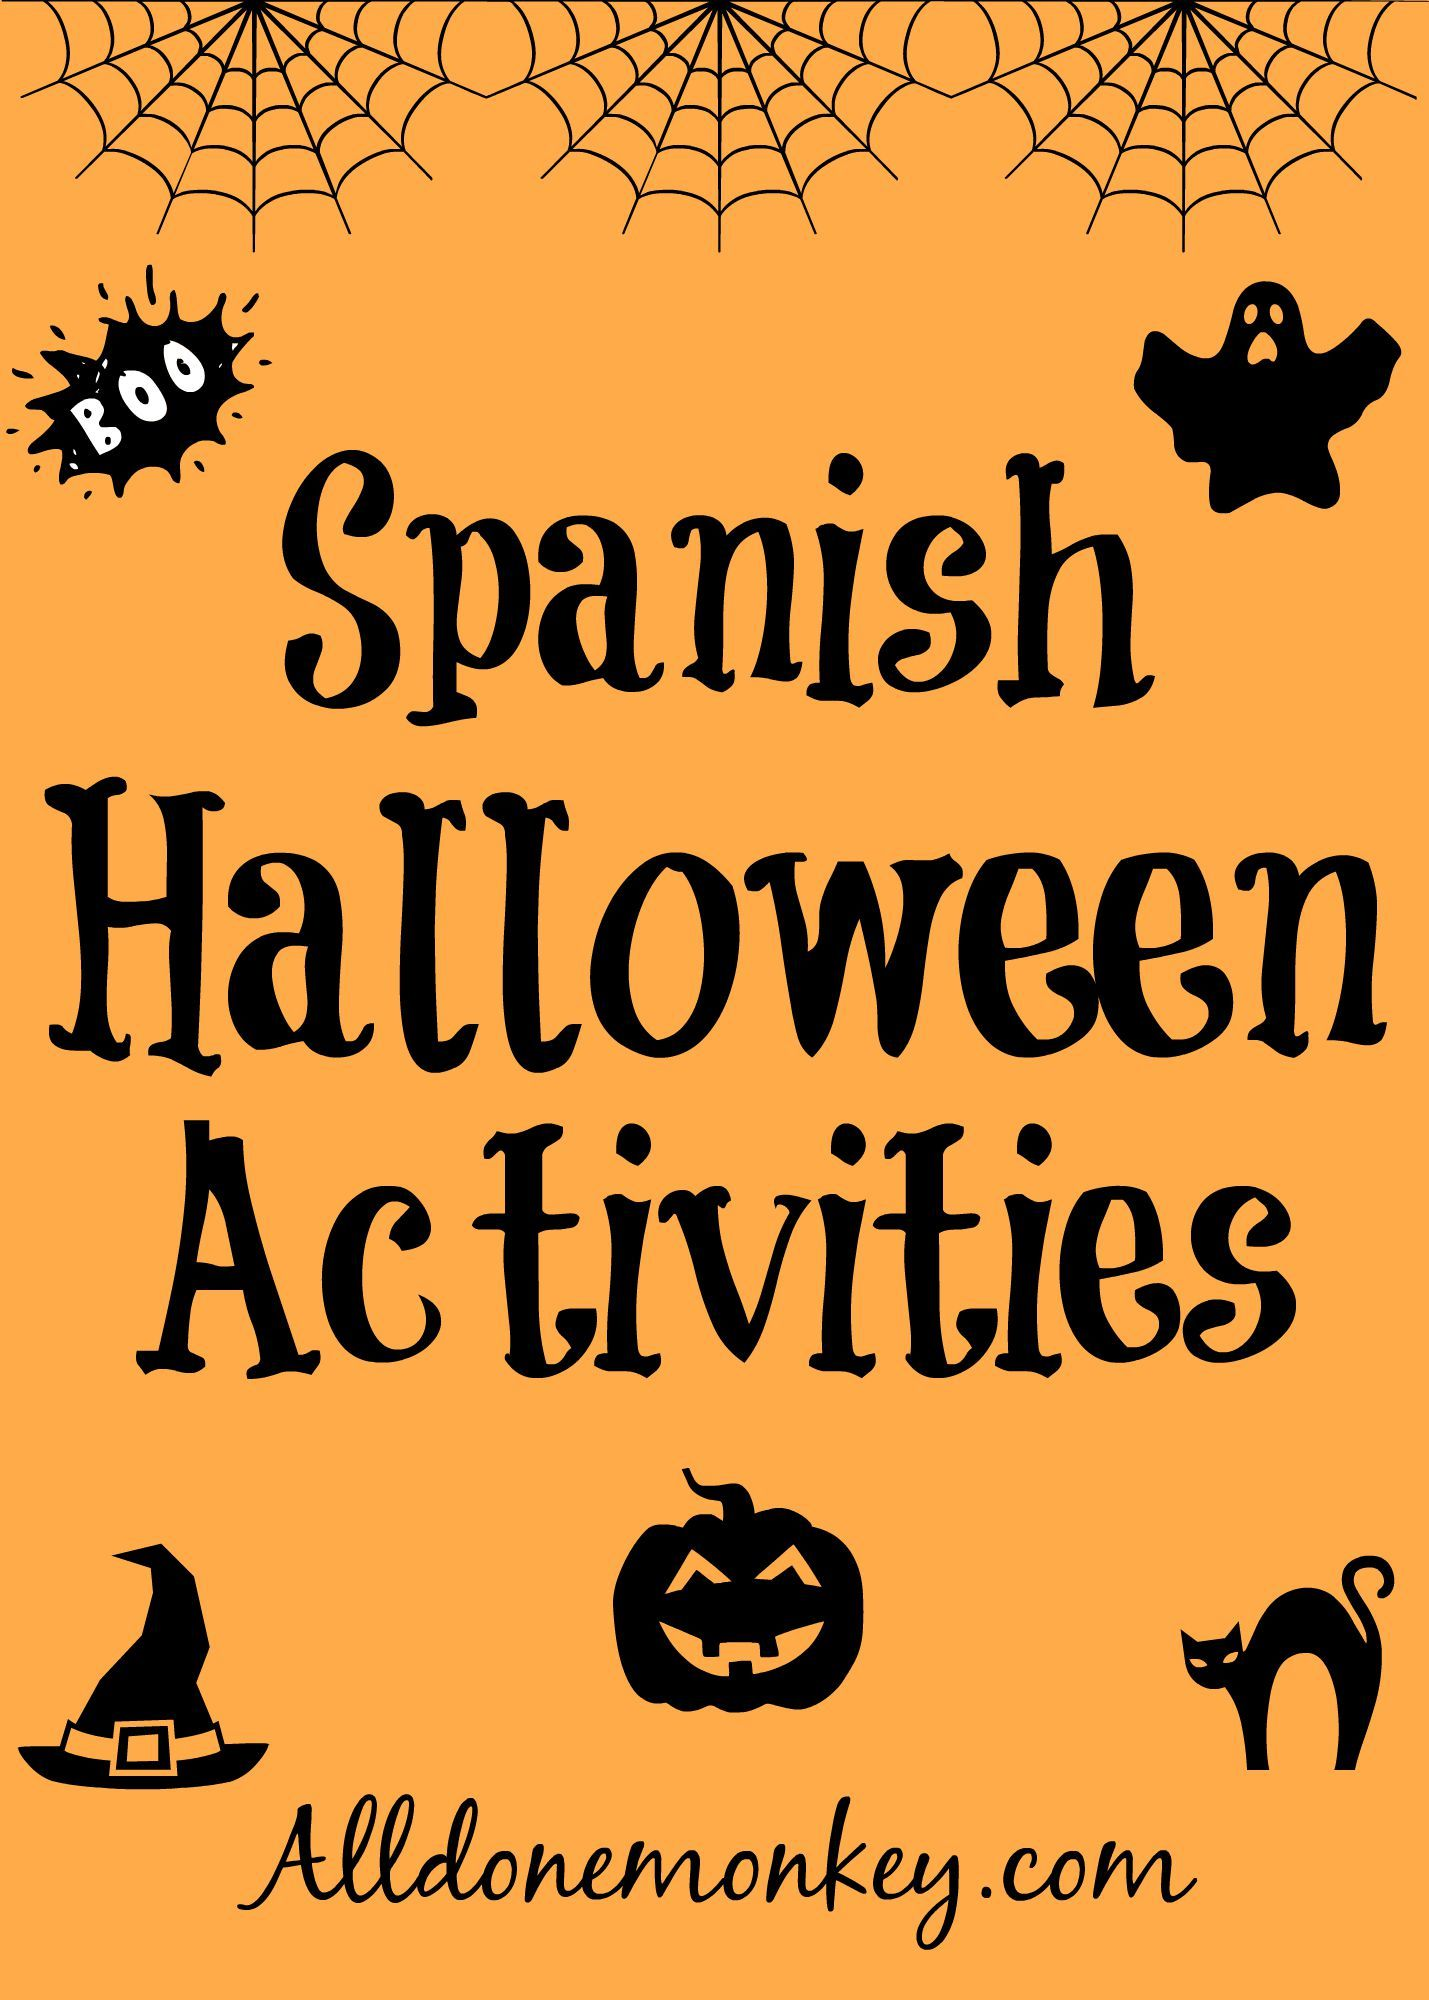 Spanish Halloween Activities